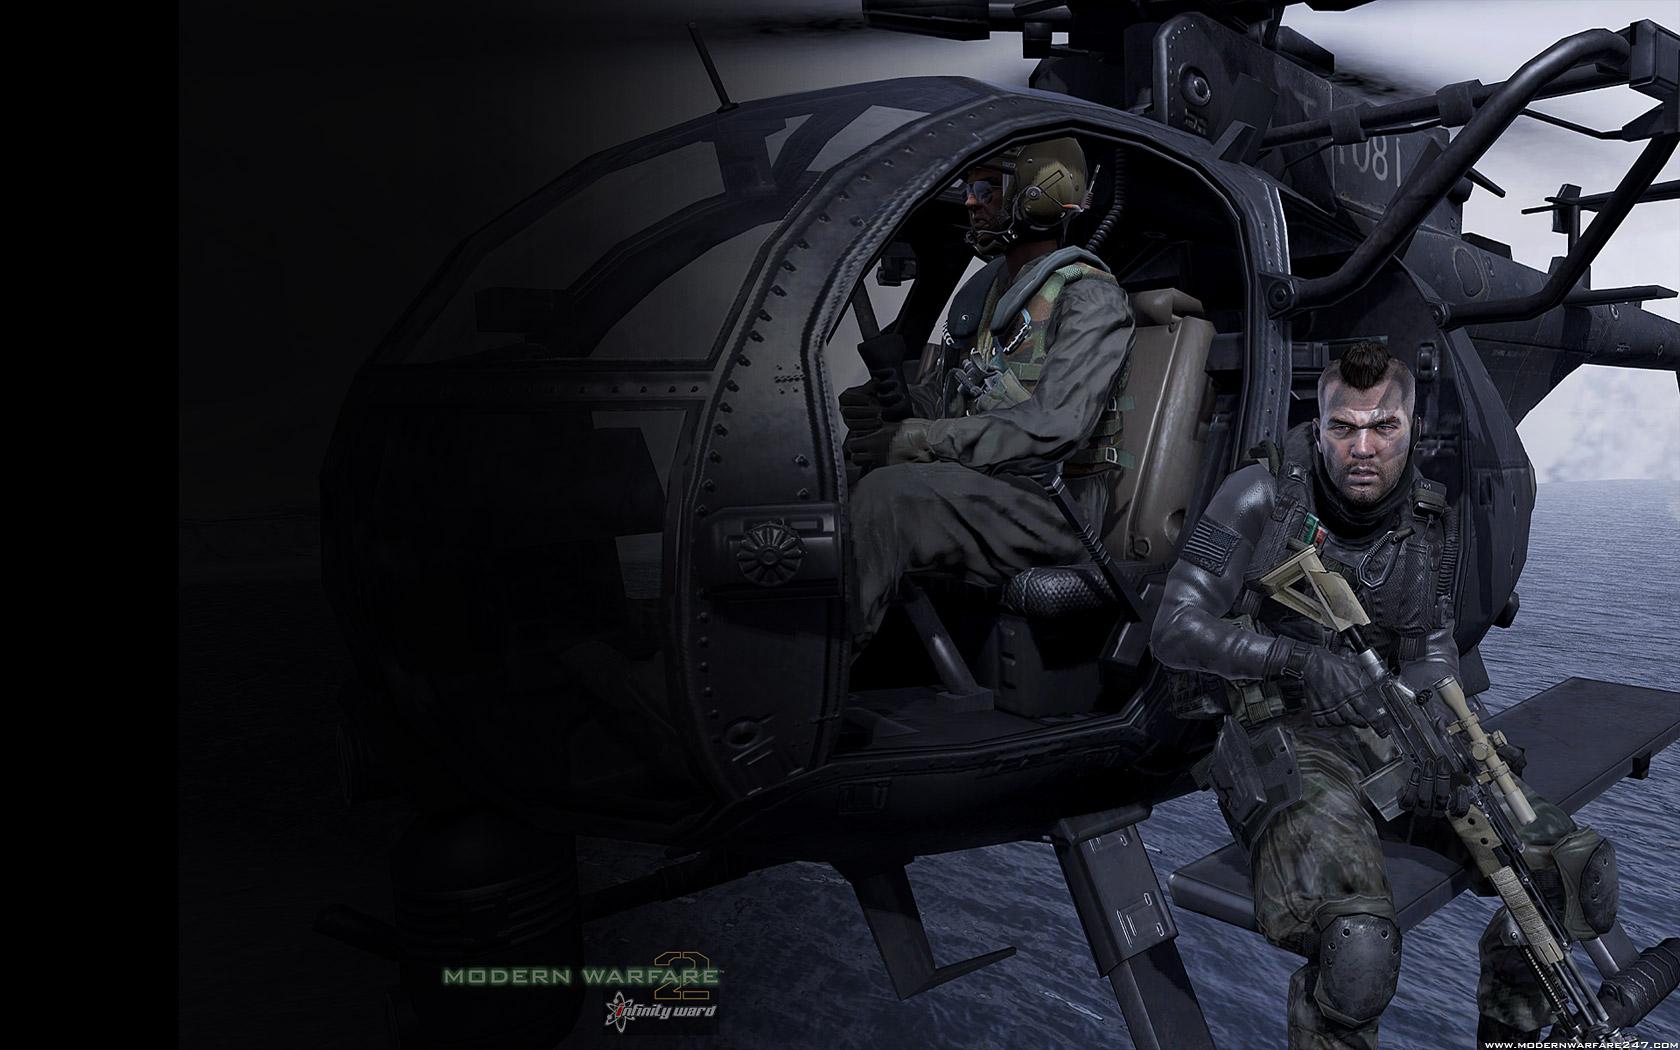 Depth Photo 3d Live Wallpaper Download Call Of Duty Modern Warfare 2 Games World